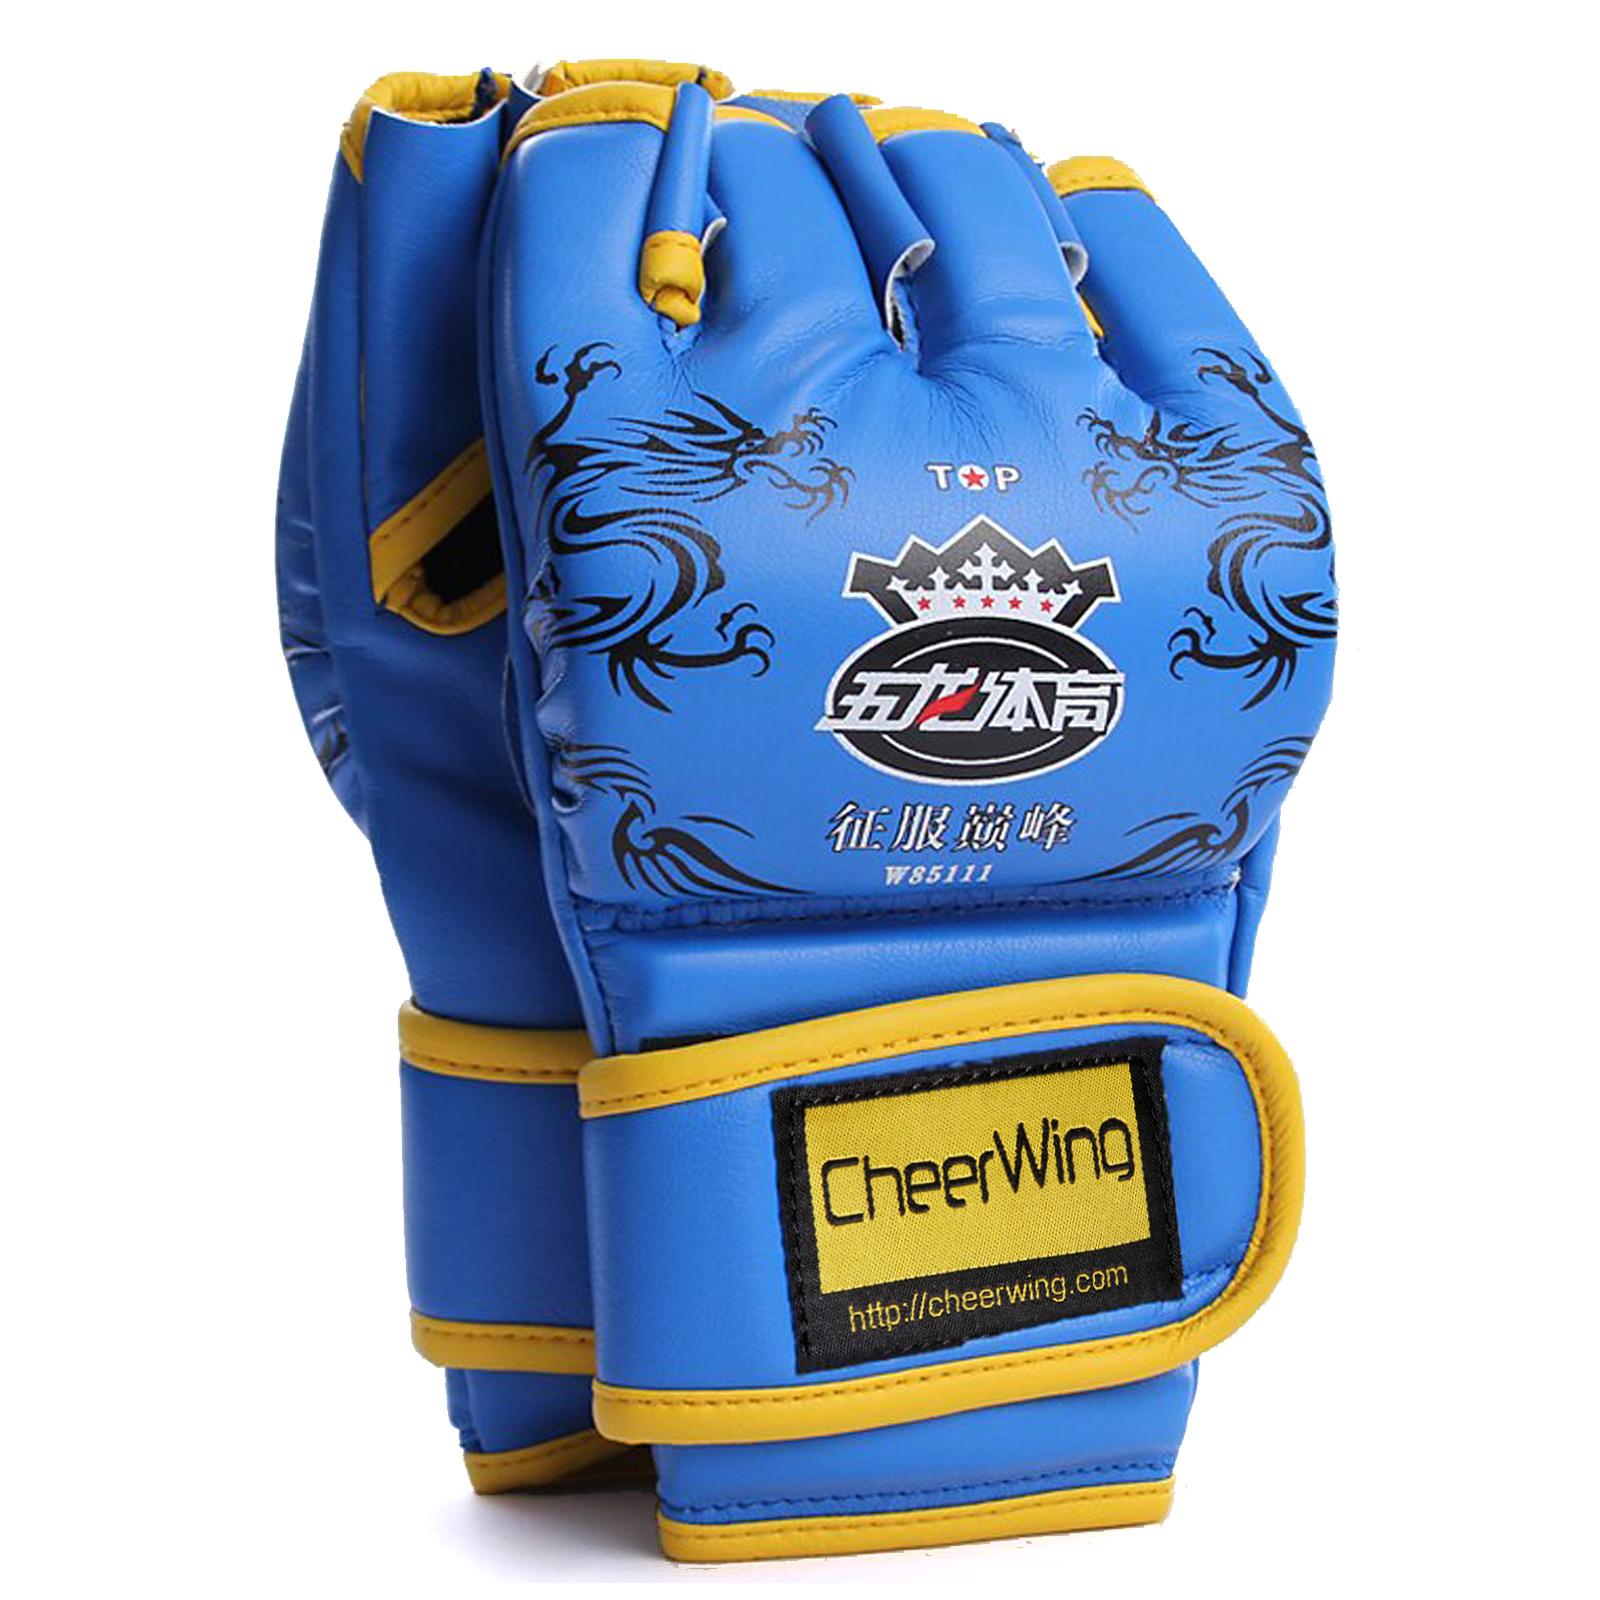 Cheerwing PU Leather MMA UFC Half Finger Boxing Gloves Sanda Fighting Sandbag Gloves Punch Mitts of Training